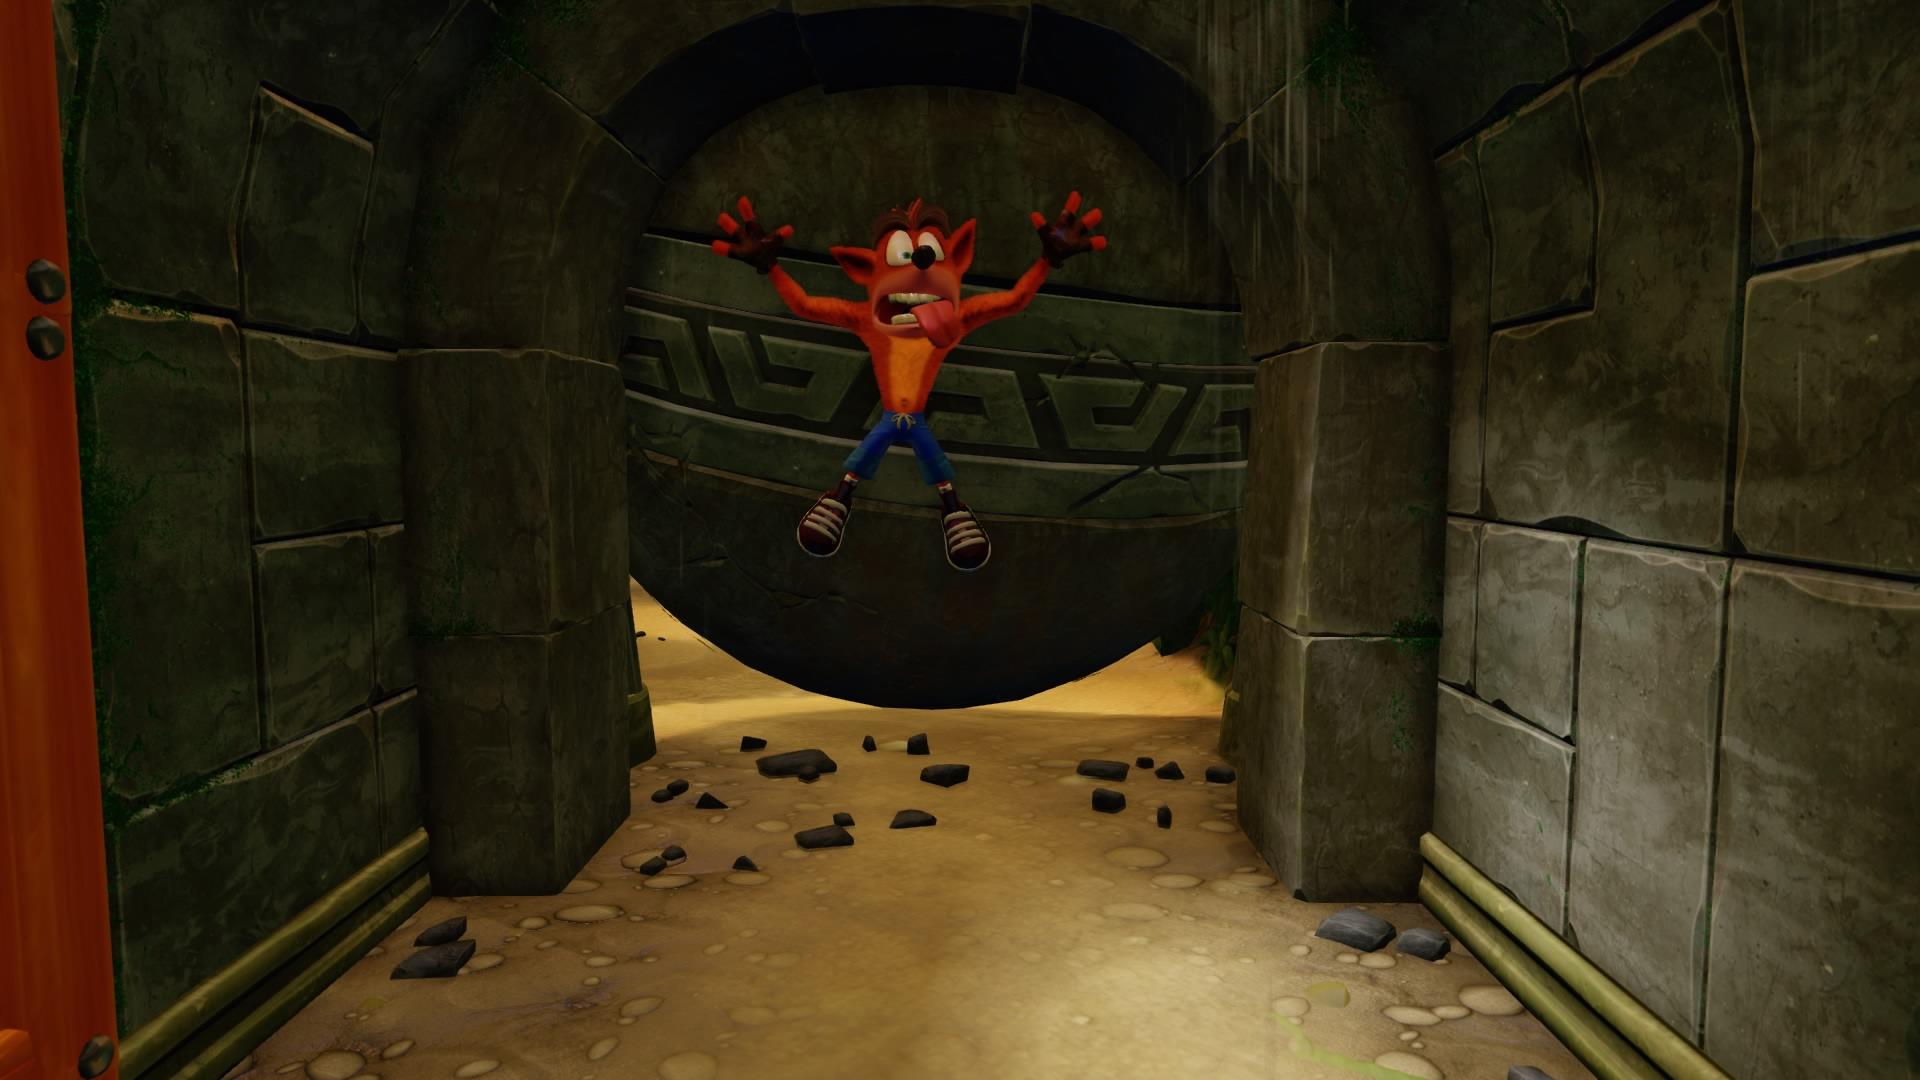 10 most infuriating Crash Bandicoot N. Sane Trilogy levels